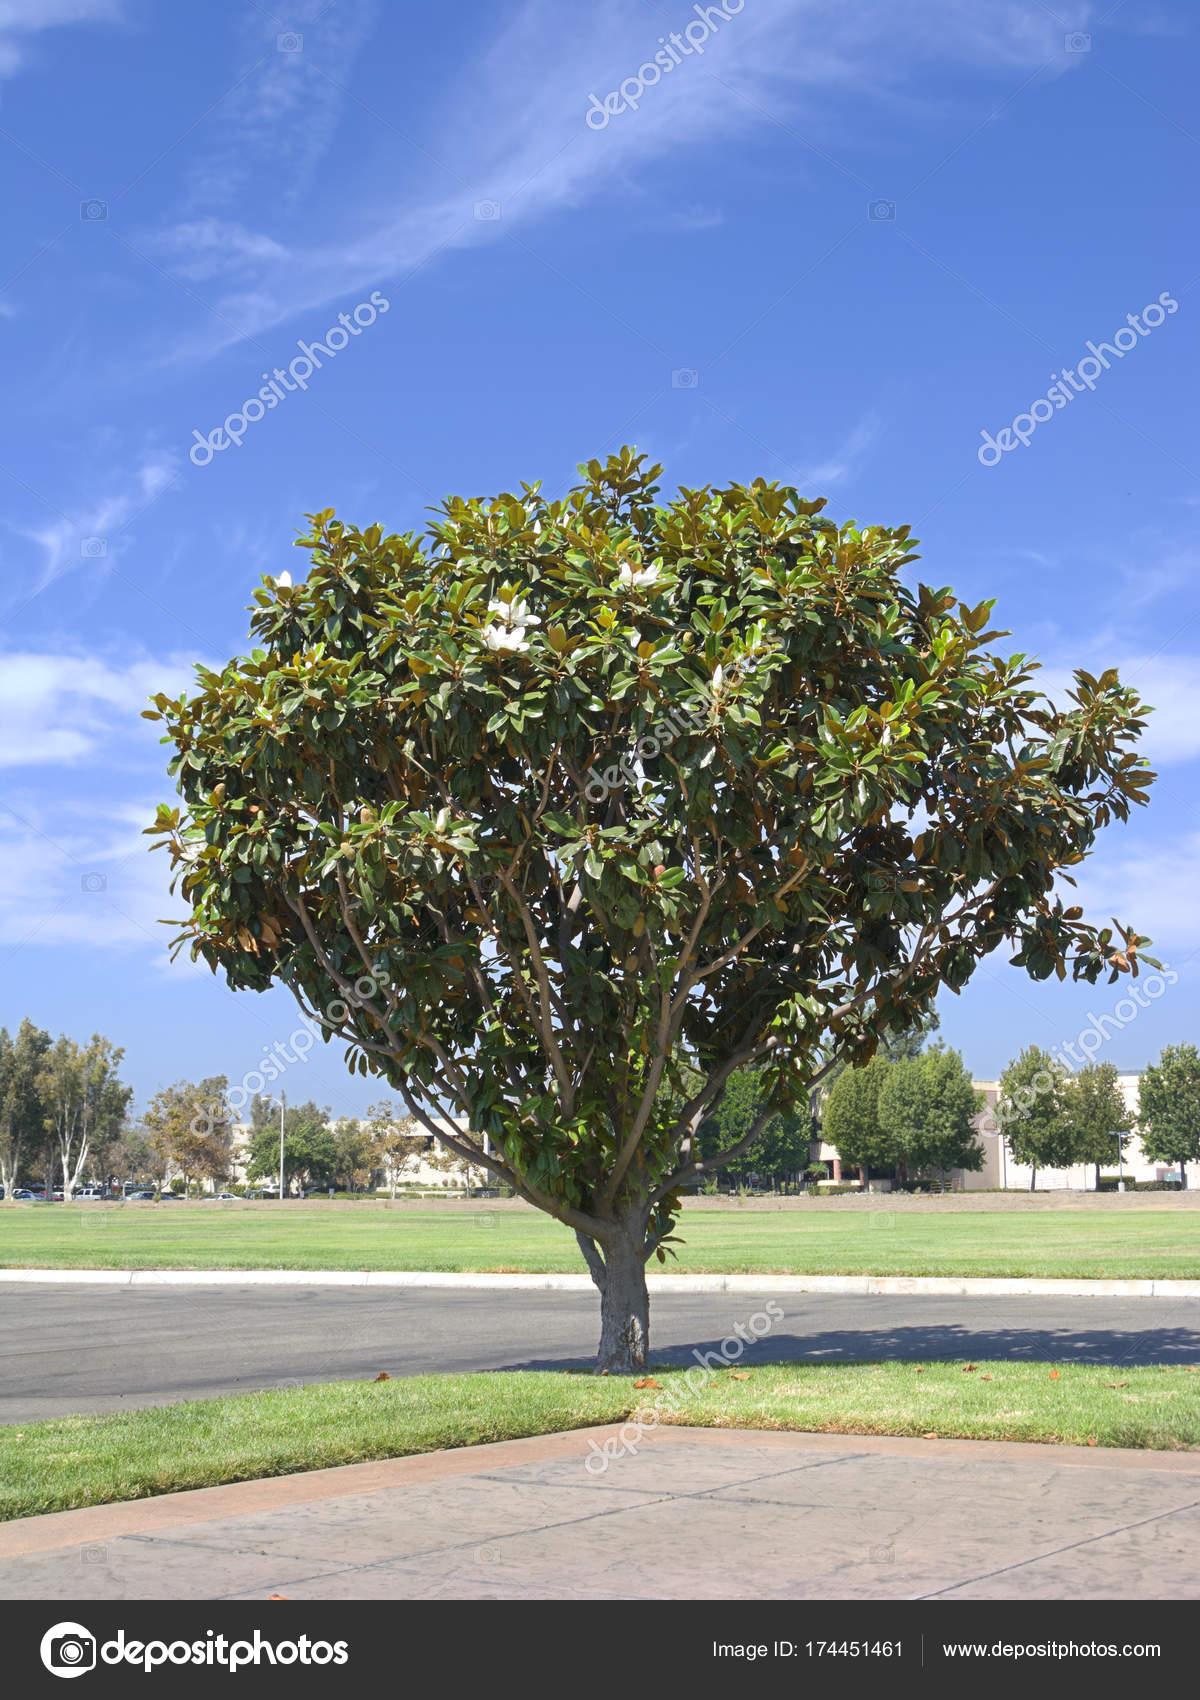 California magnolia tree stock photo fotoch 174451461 southern california magnolia tree with open white flowers photo by fotoch mightylinksfo